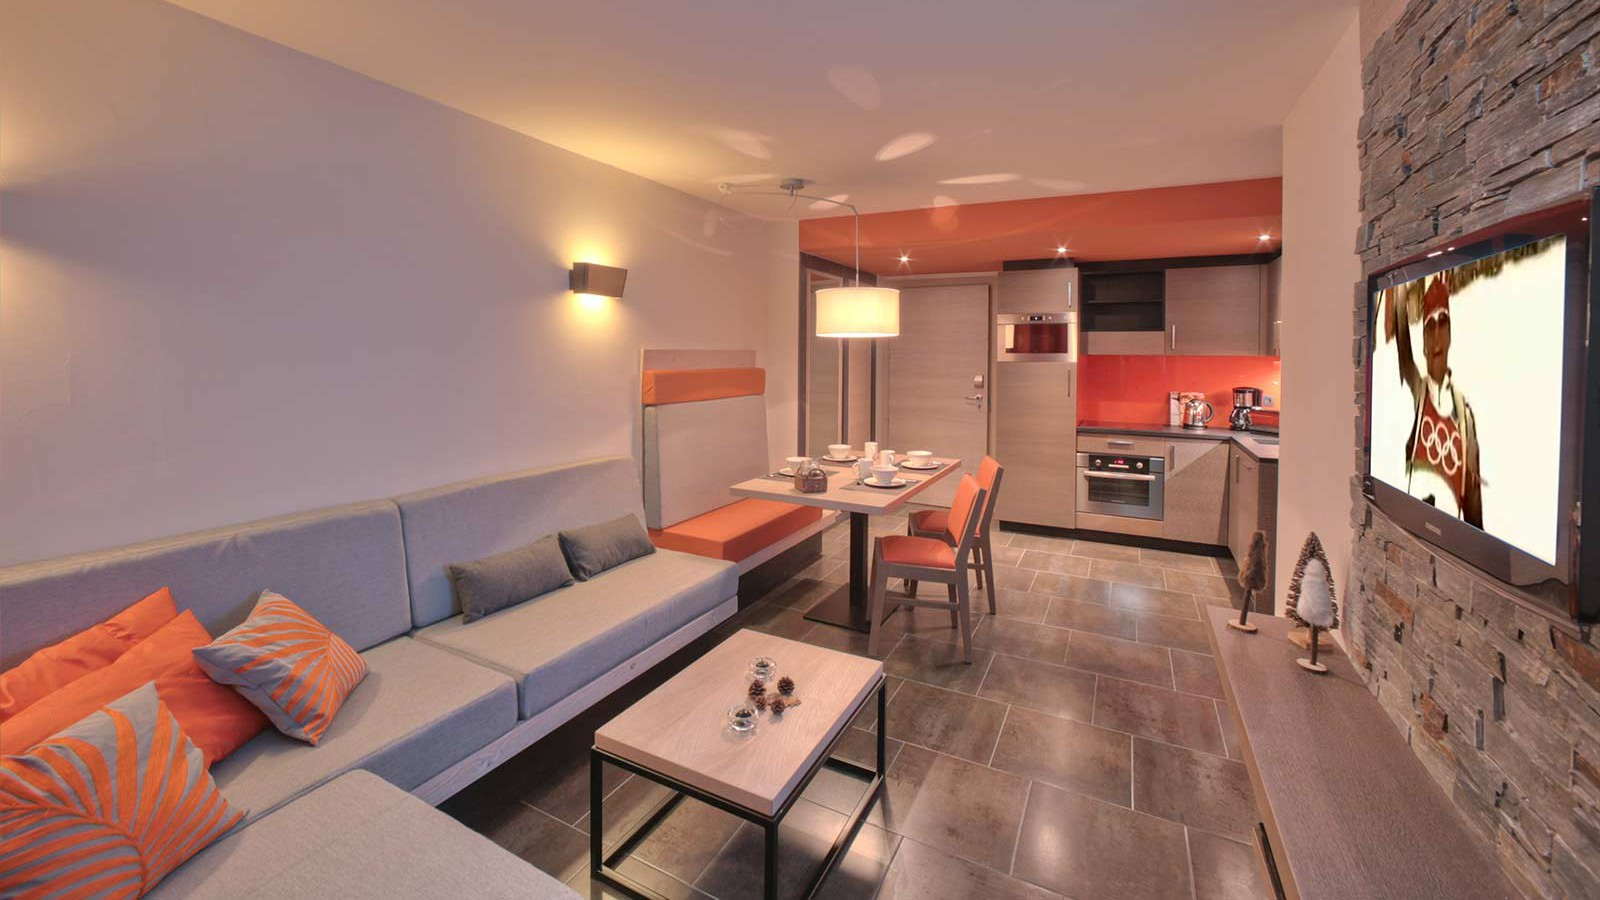 Residence Plein Sud, Val Thorens - Apartments